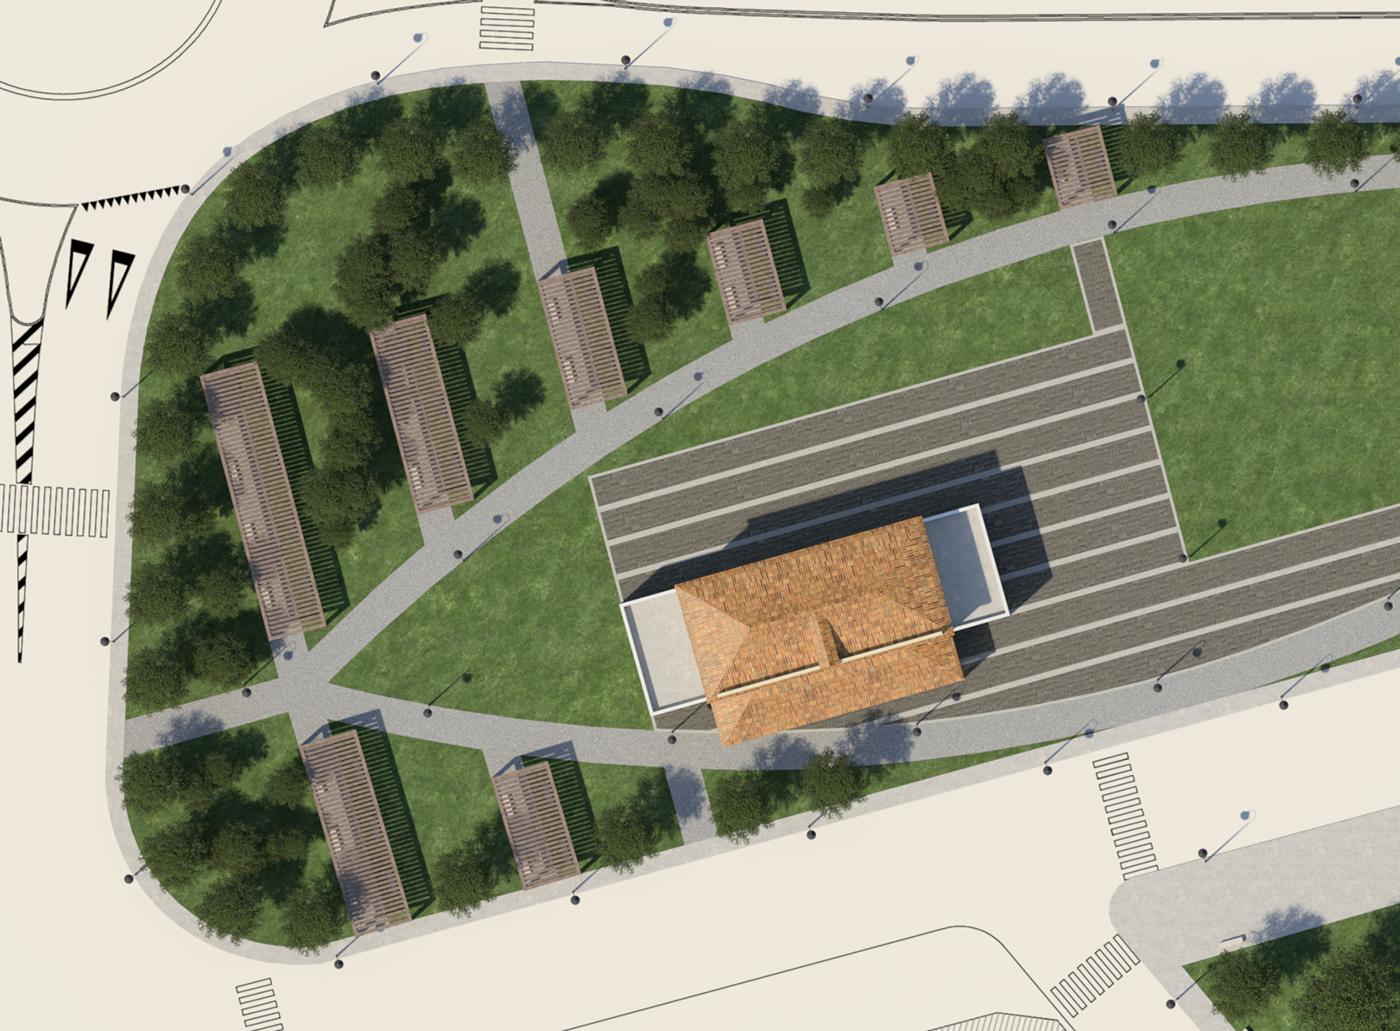 exterior Landscape design 3D Render vray 3ds max architecture visualization